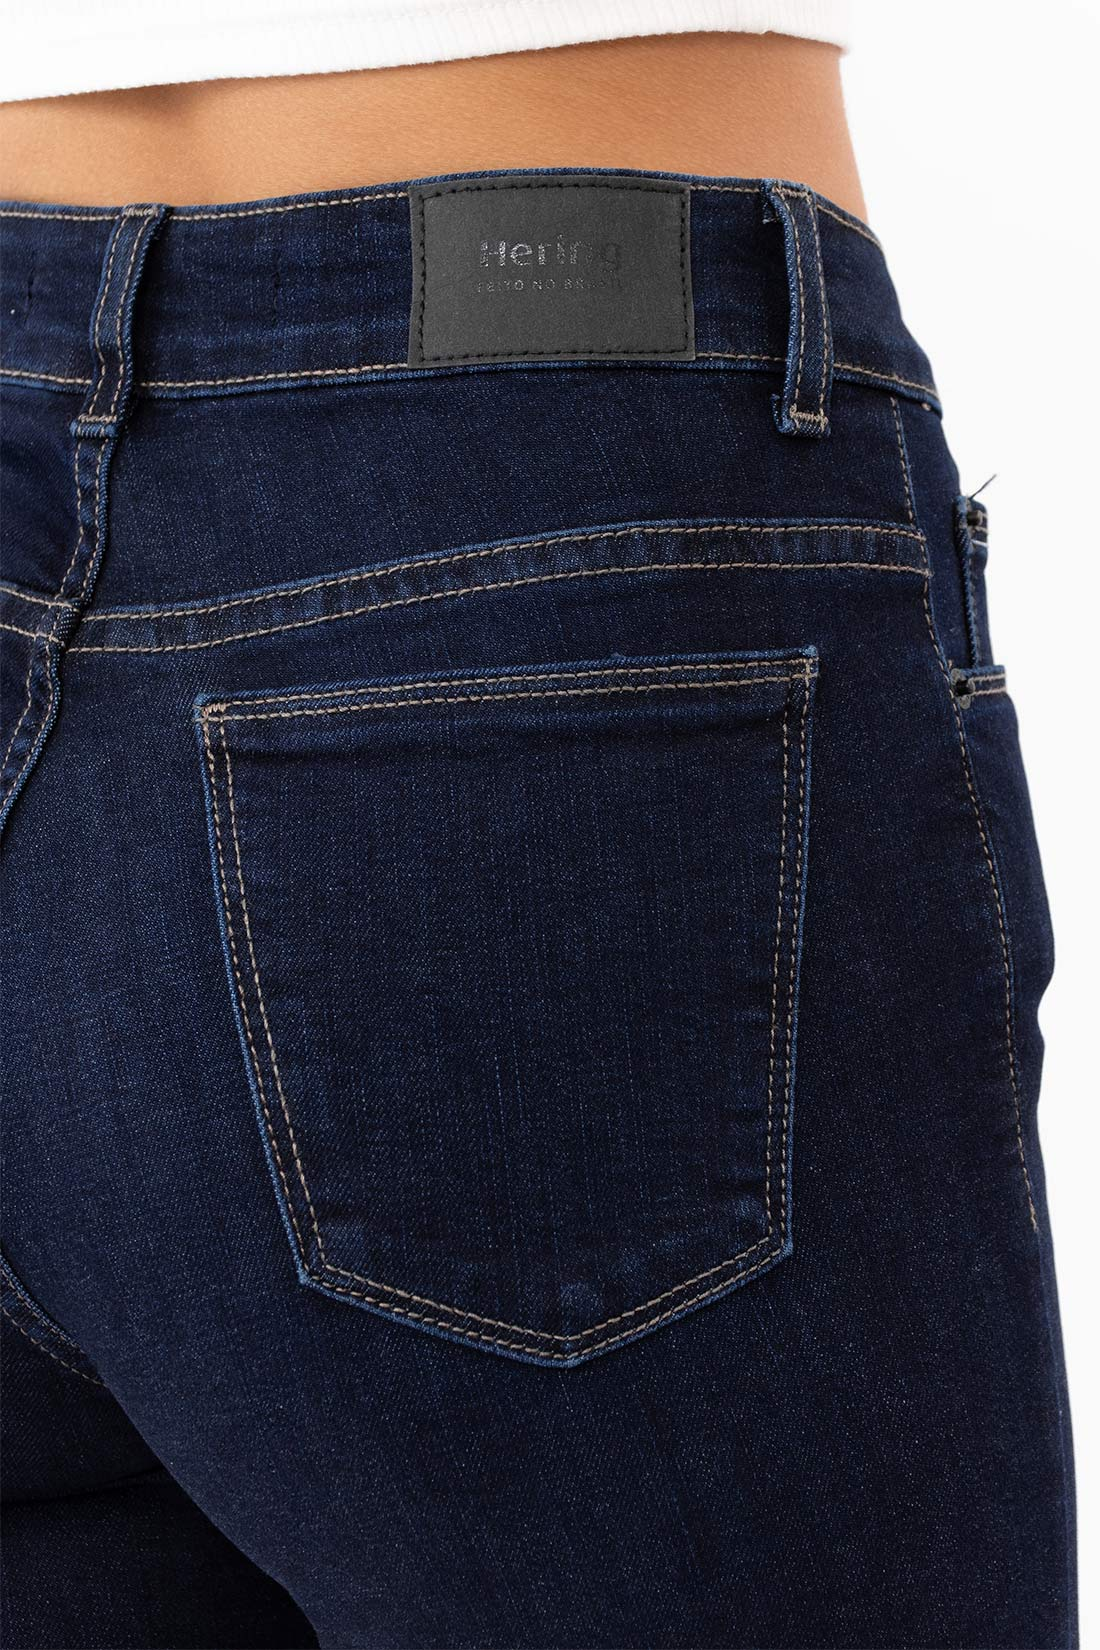 Calca Jeans Hering Super Skinny